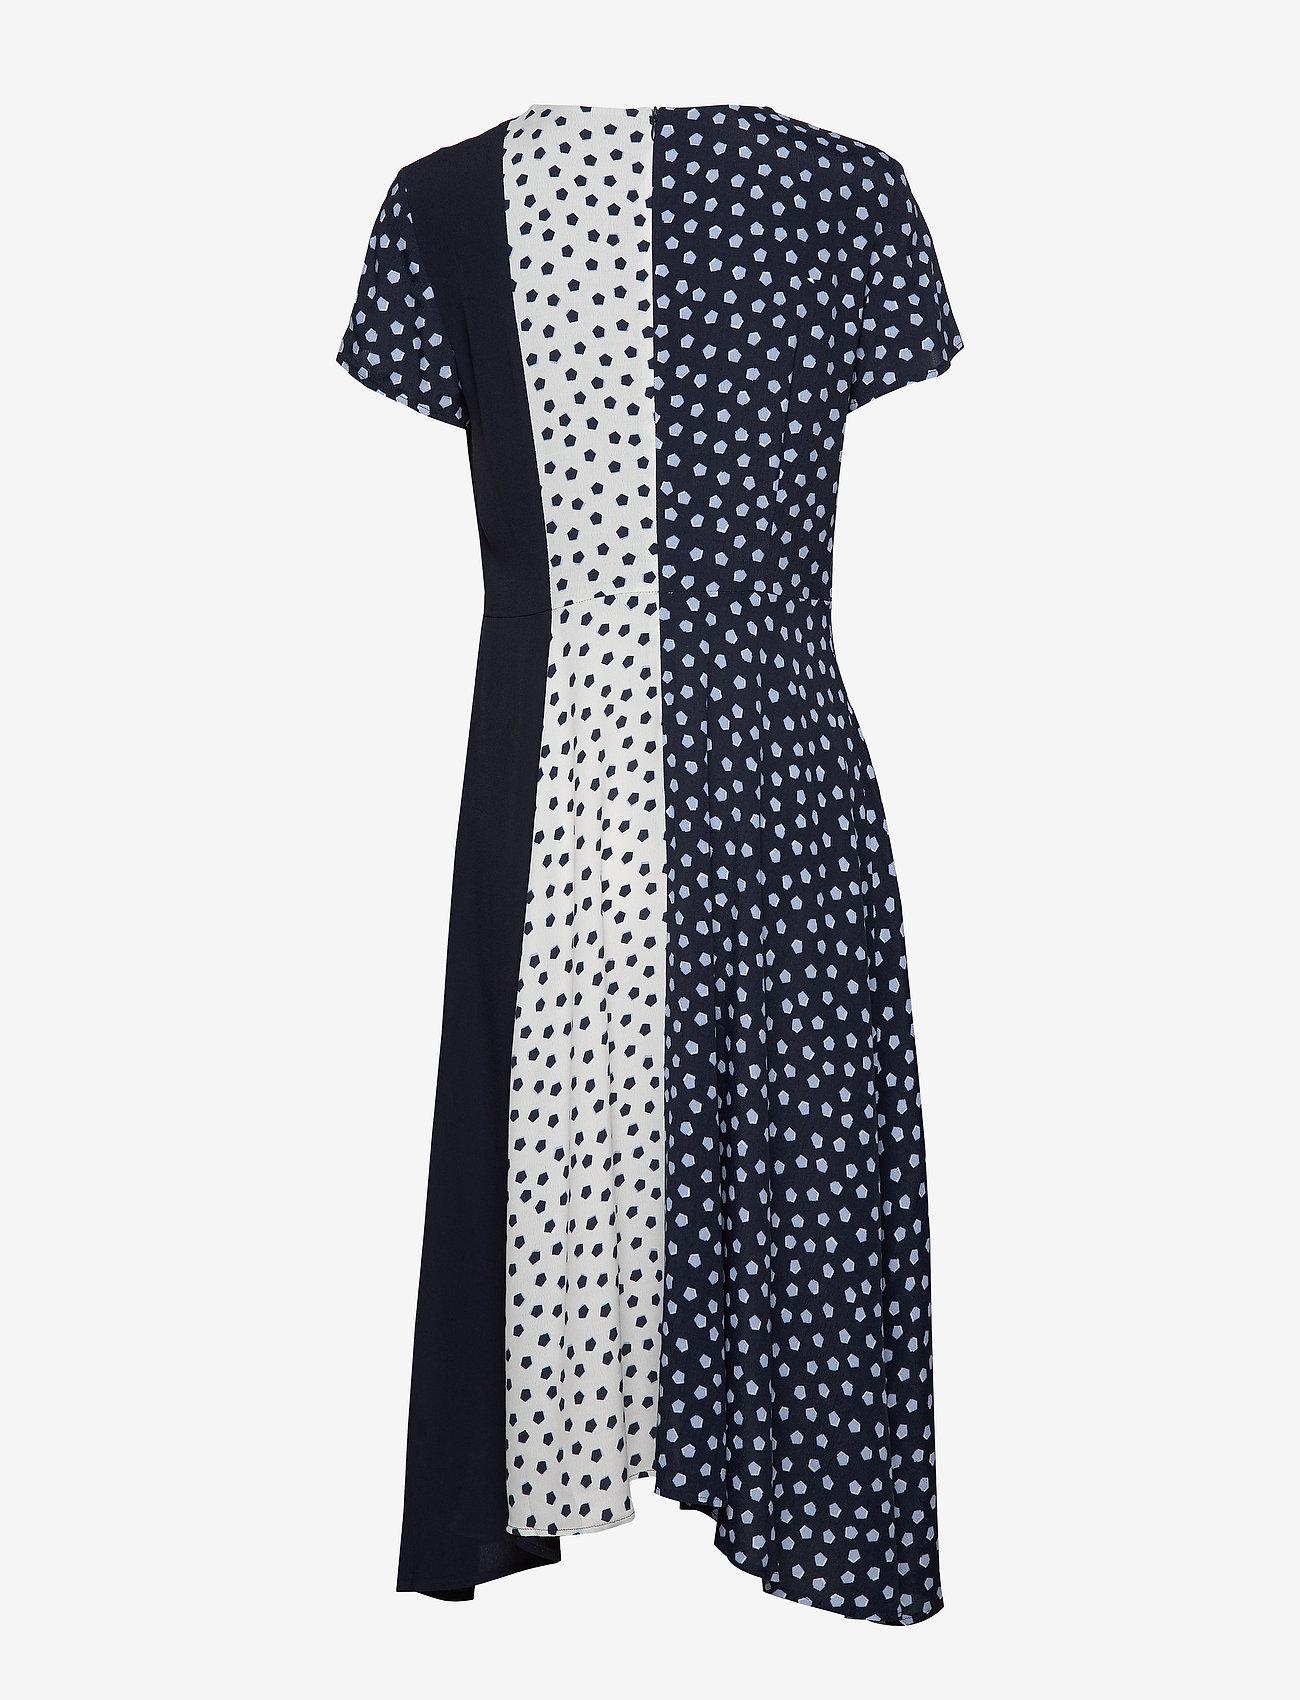 Taifun - DRESS WOVEN FABRIC - midiklänningar - blue shadow patterned - 1